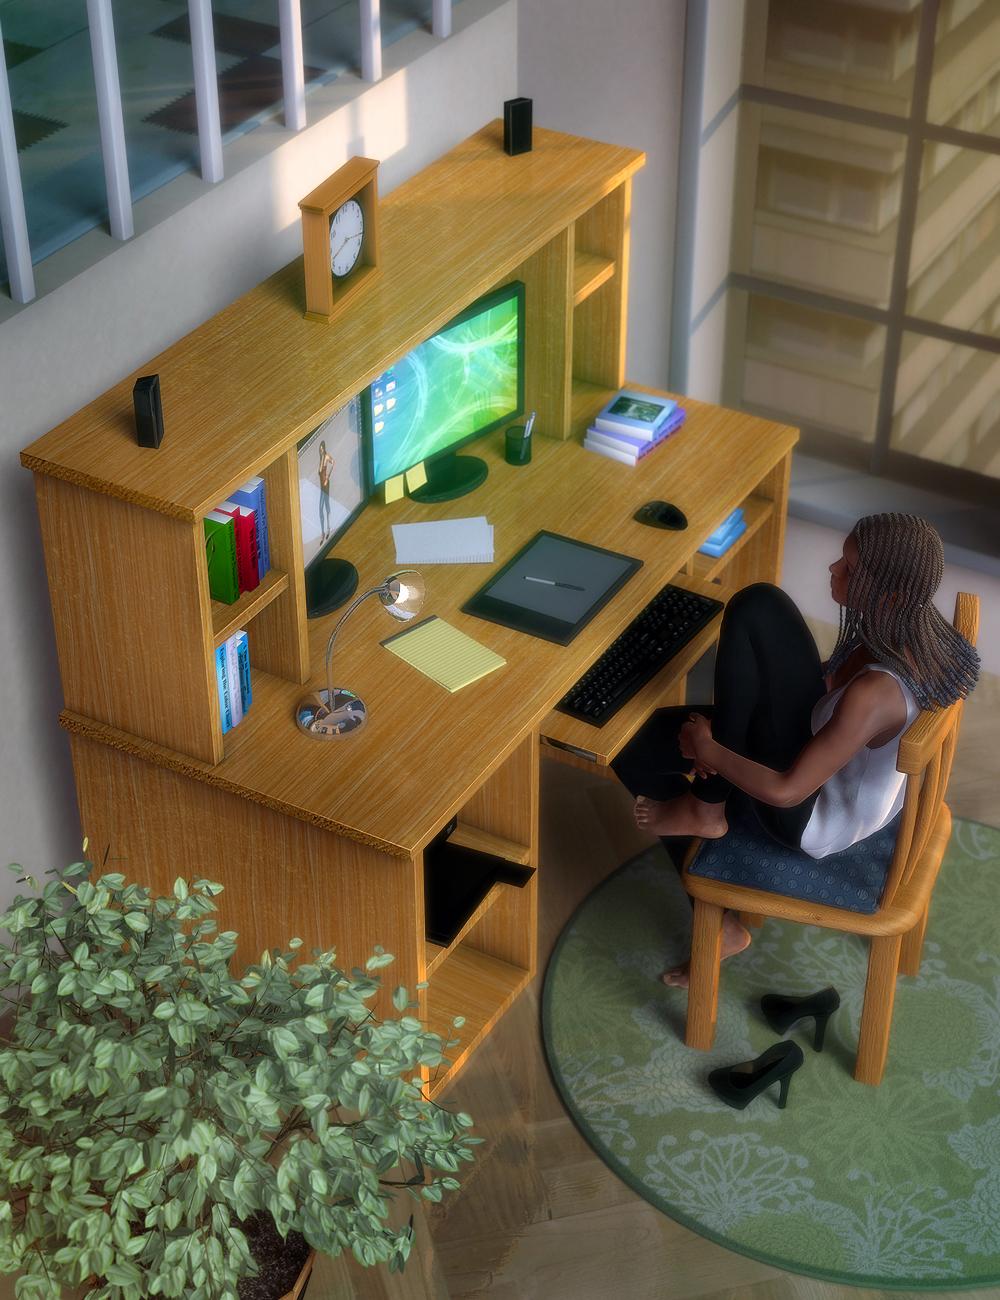 Work Desk Set by: ARTCollab, 3D Models by Daz 3D